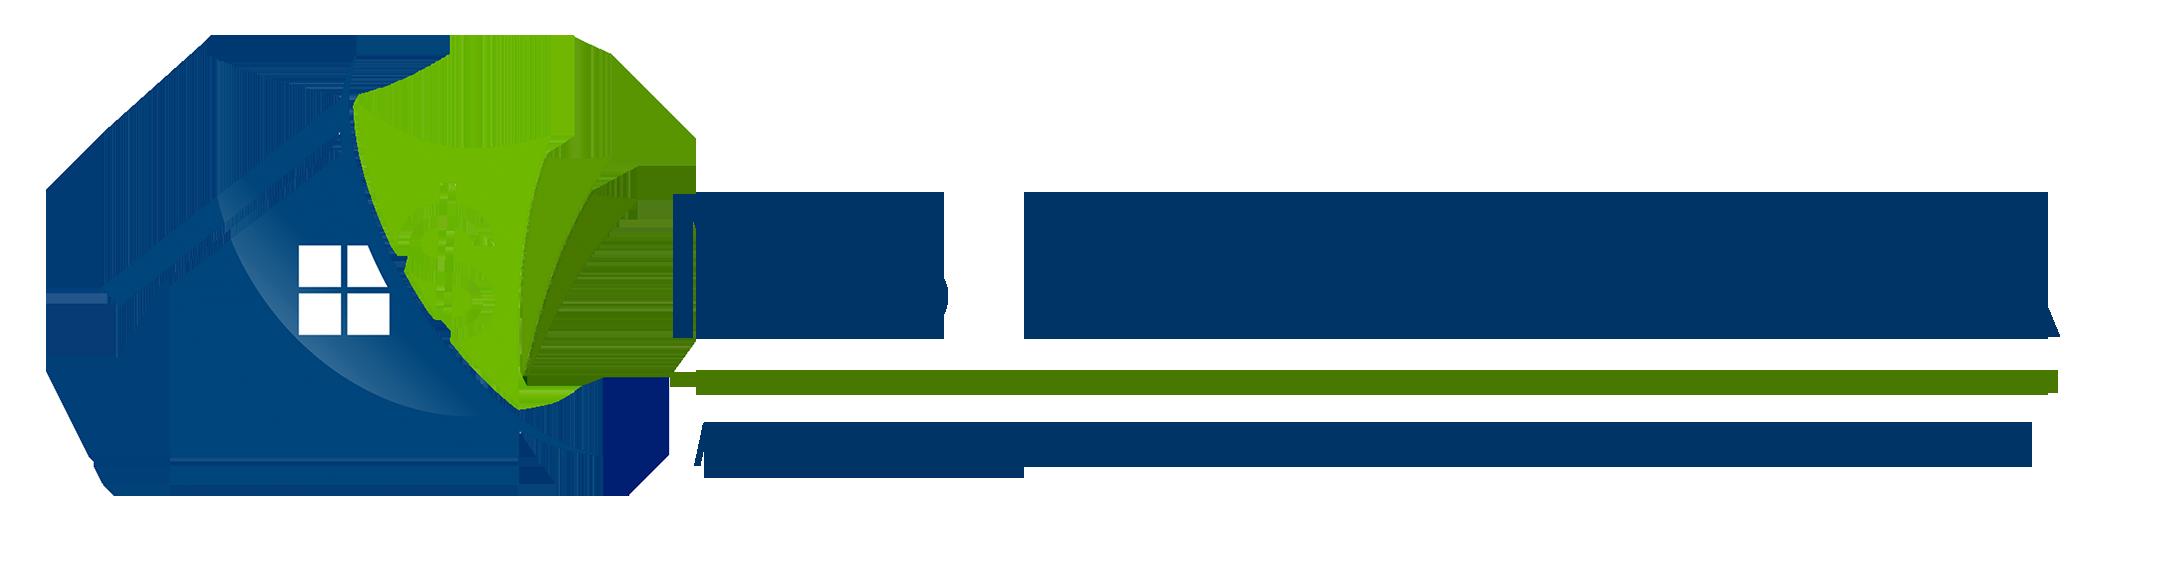 MS COAST REIA Logo - HORIZONTAL.png